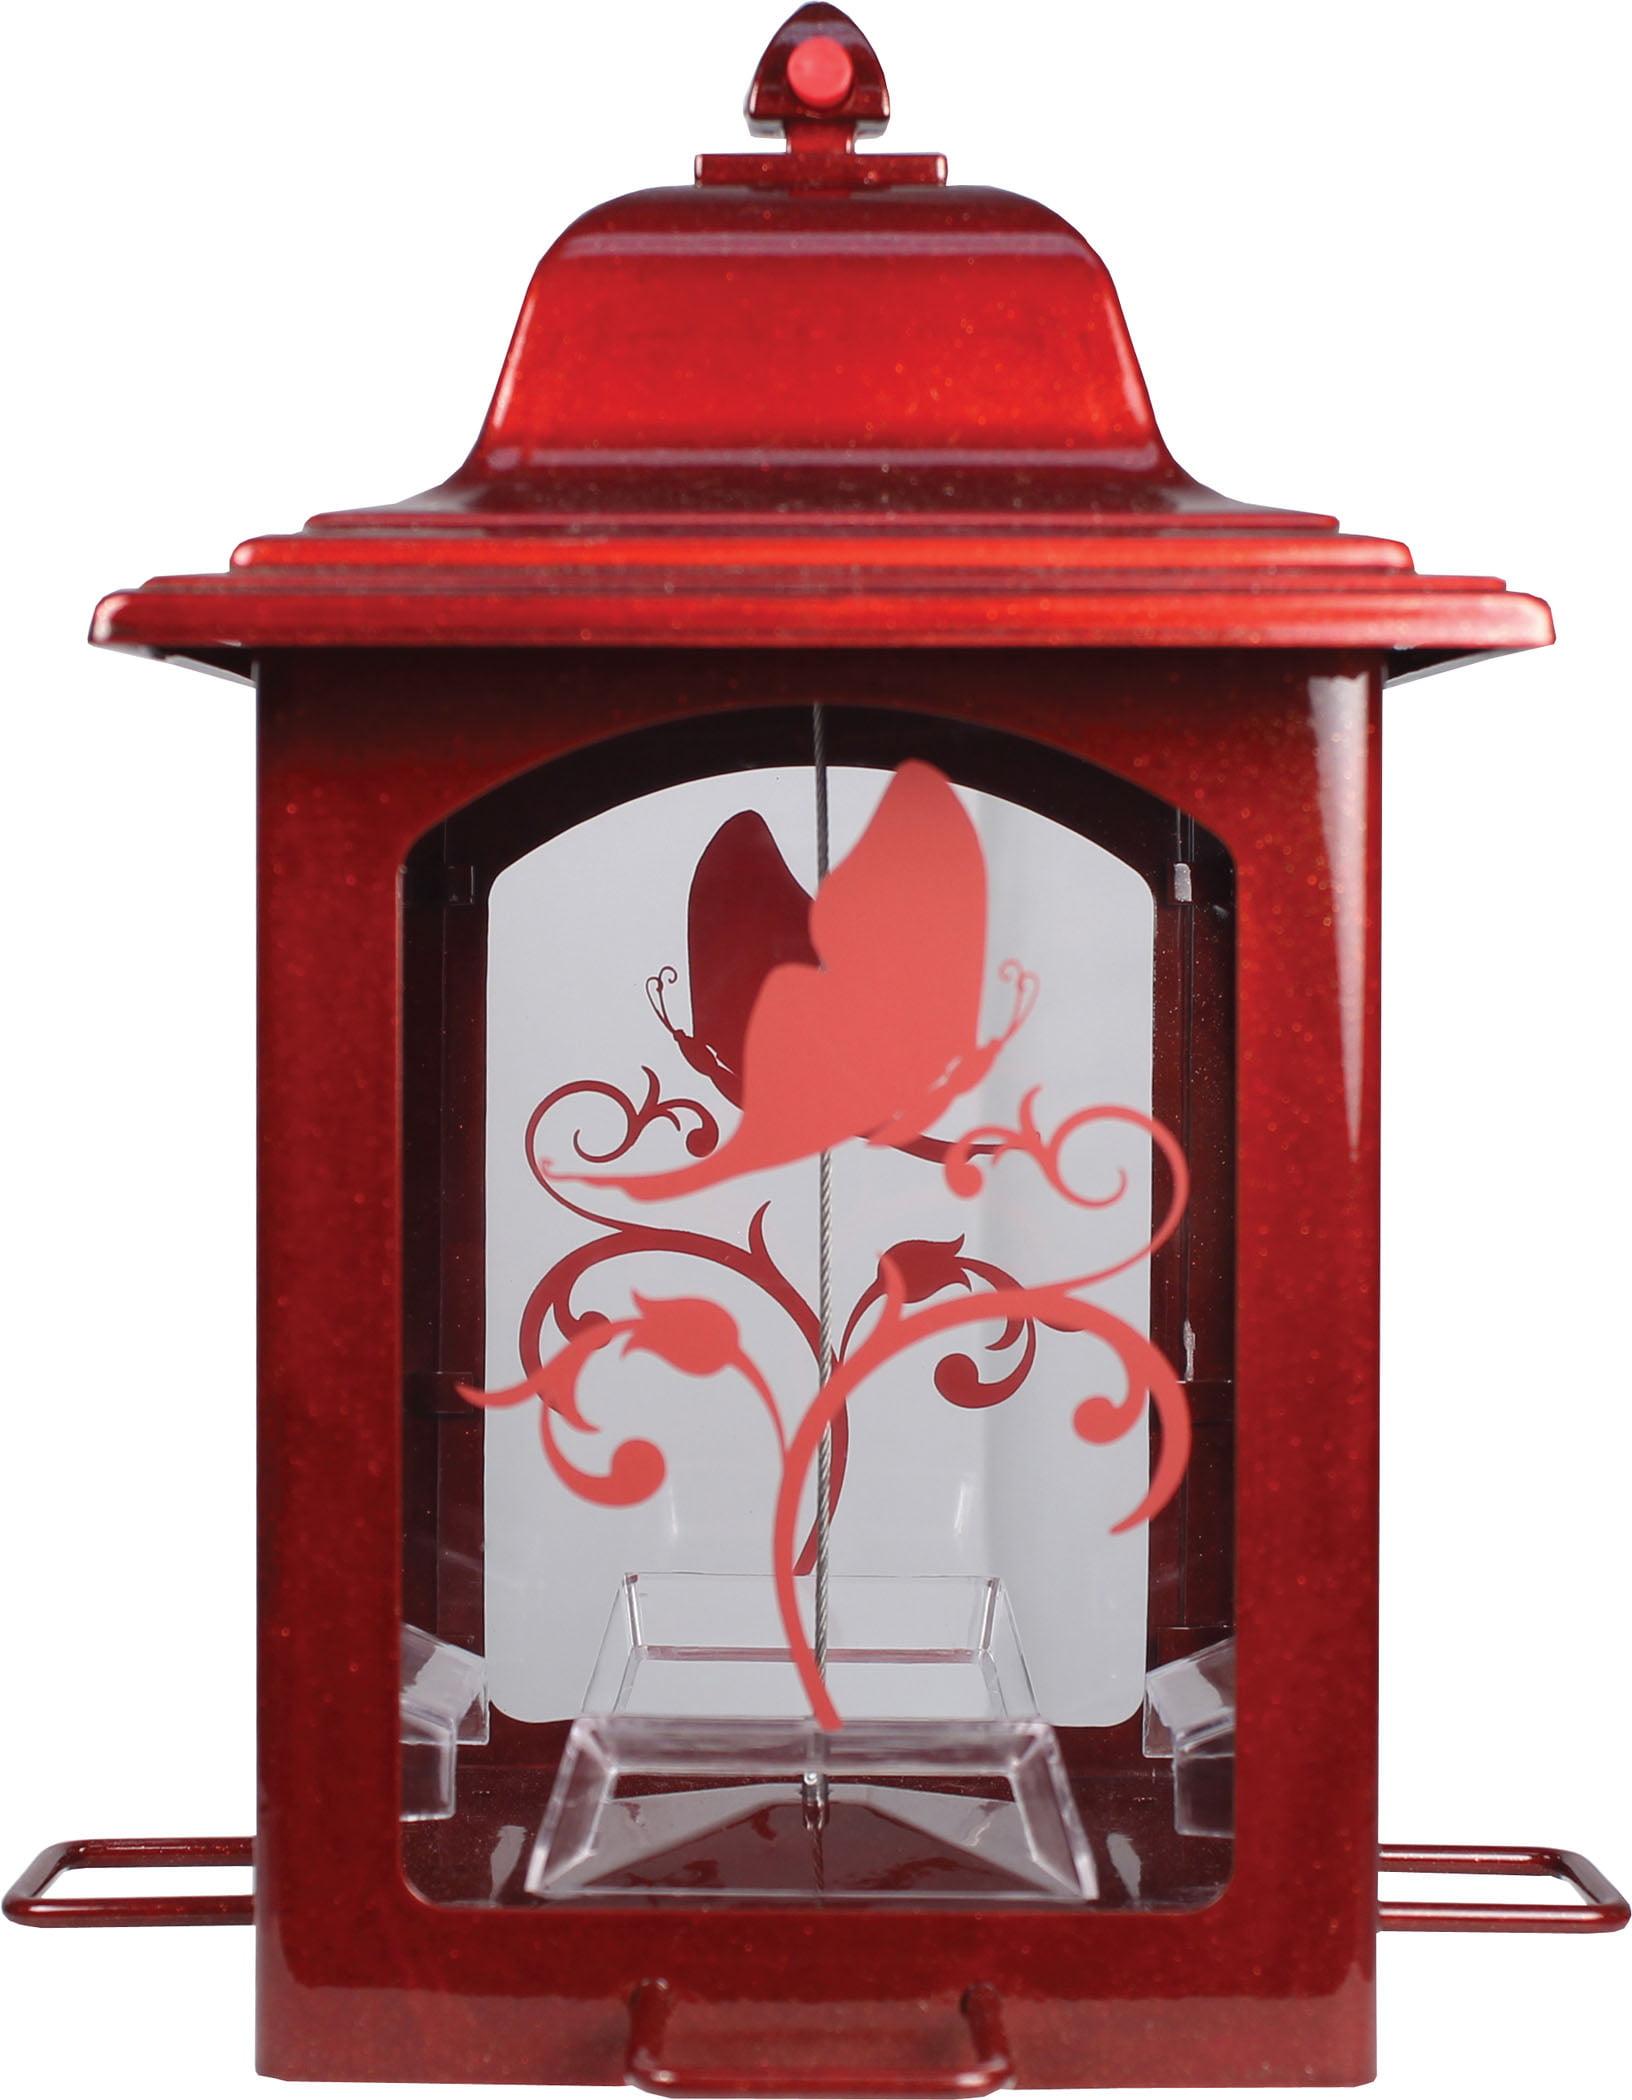 Perky-Pet Red Sparkle Lantern Wild Birdfeeder by Perky-Pet